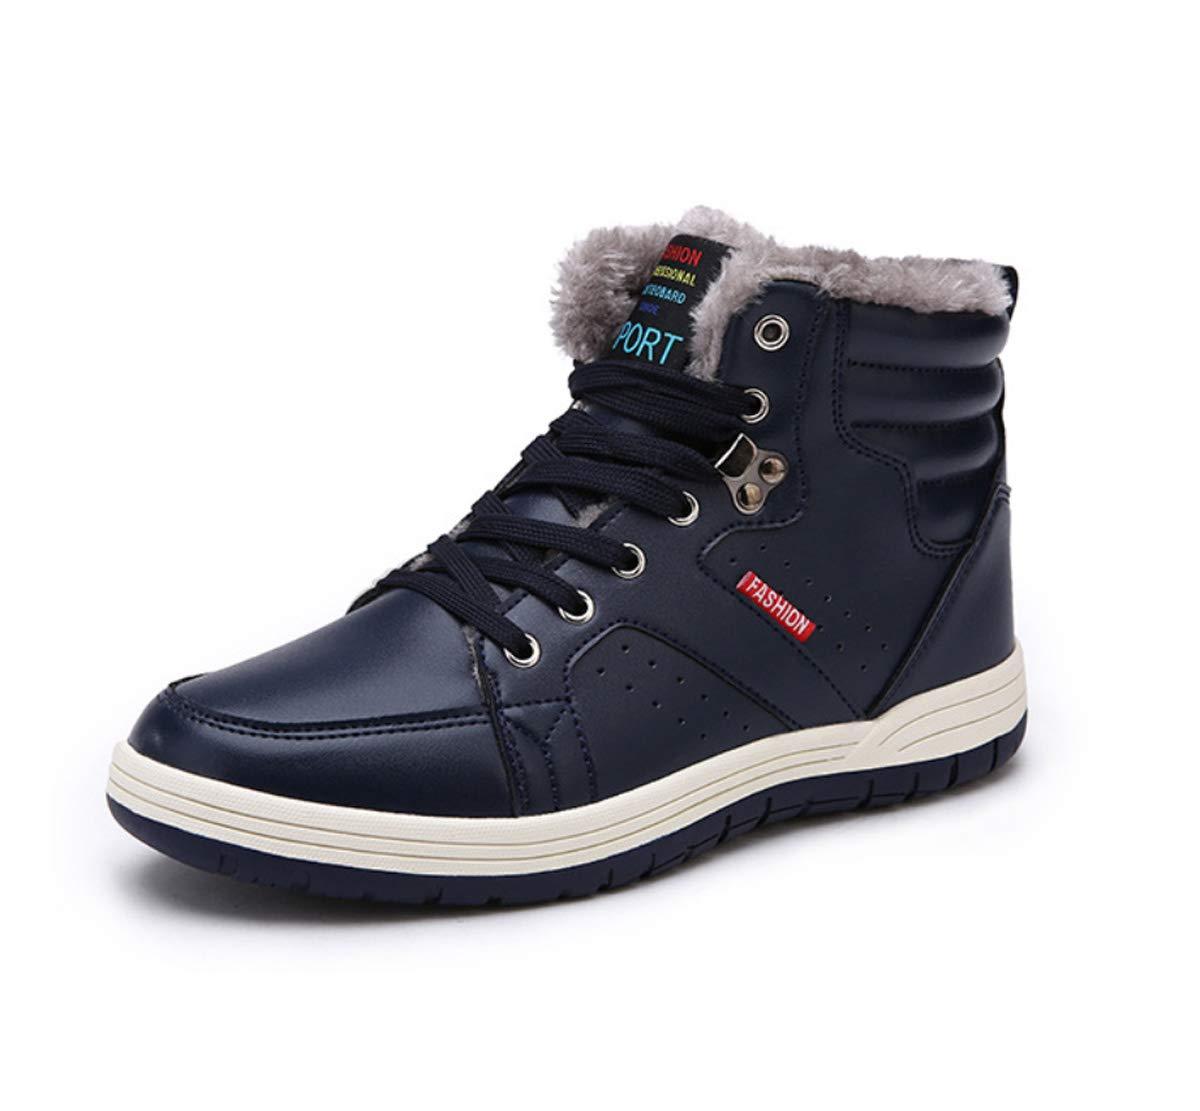 DANDANJIE Herren Warme Schneeschuhe Wandern Trekking Schuhe Wasserdichte High-Top Turnschuhe Anti-Slip Lace-up Winter Casual Outdoor-Schuhe